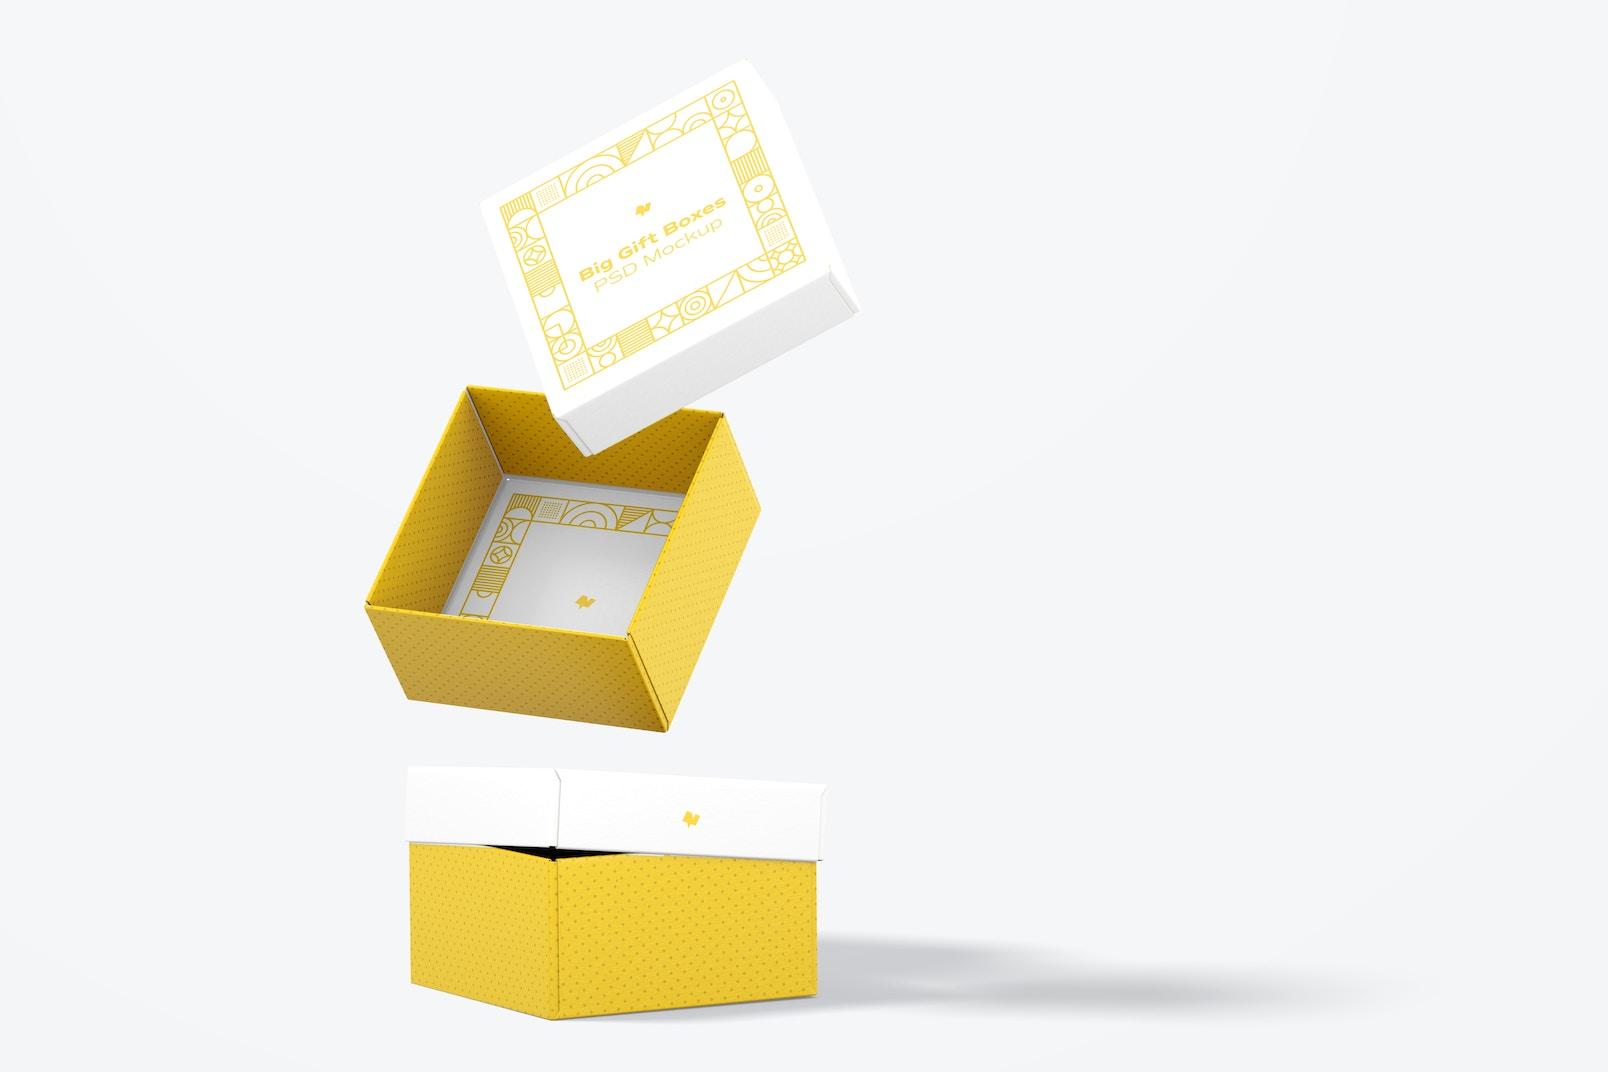 Big Gift Boxes Mockup, Falling